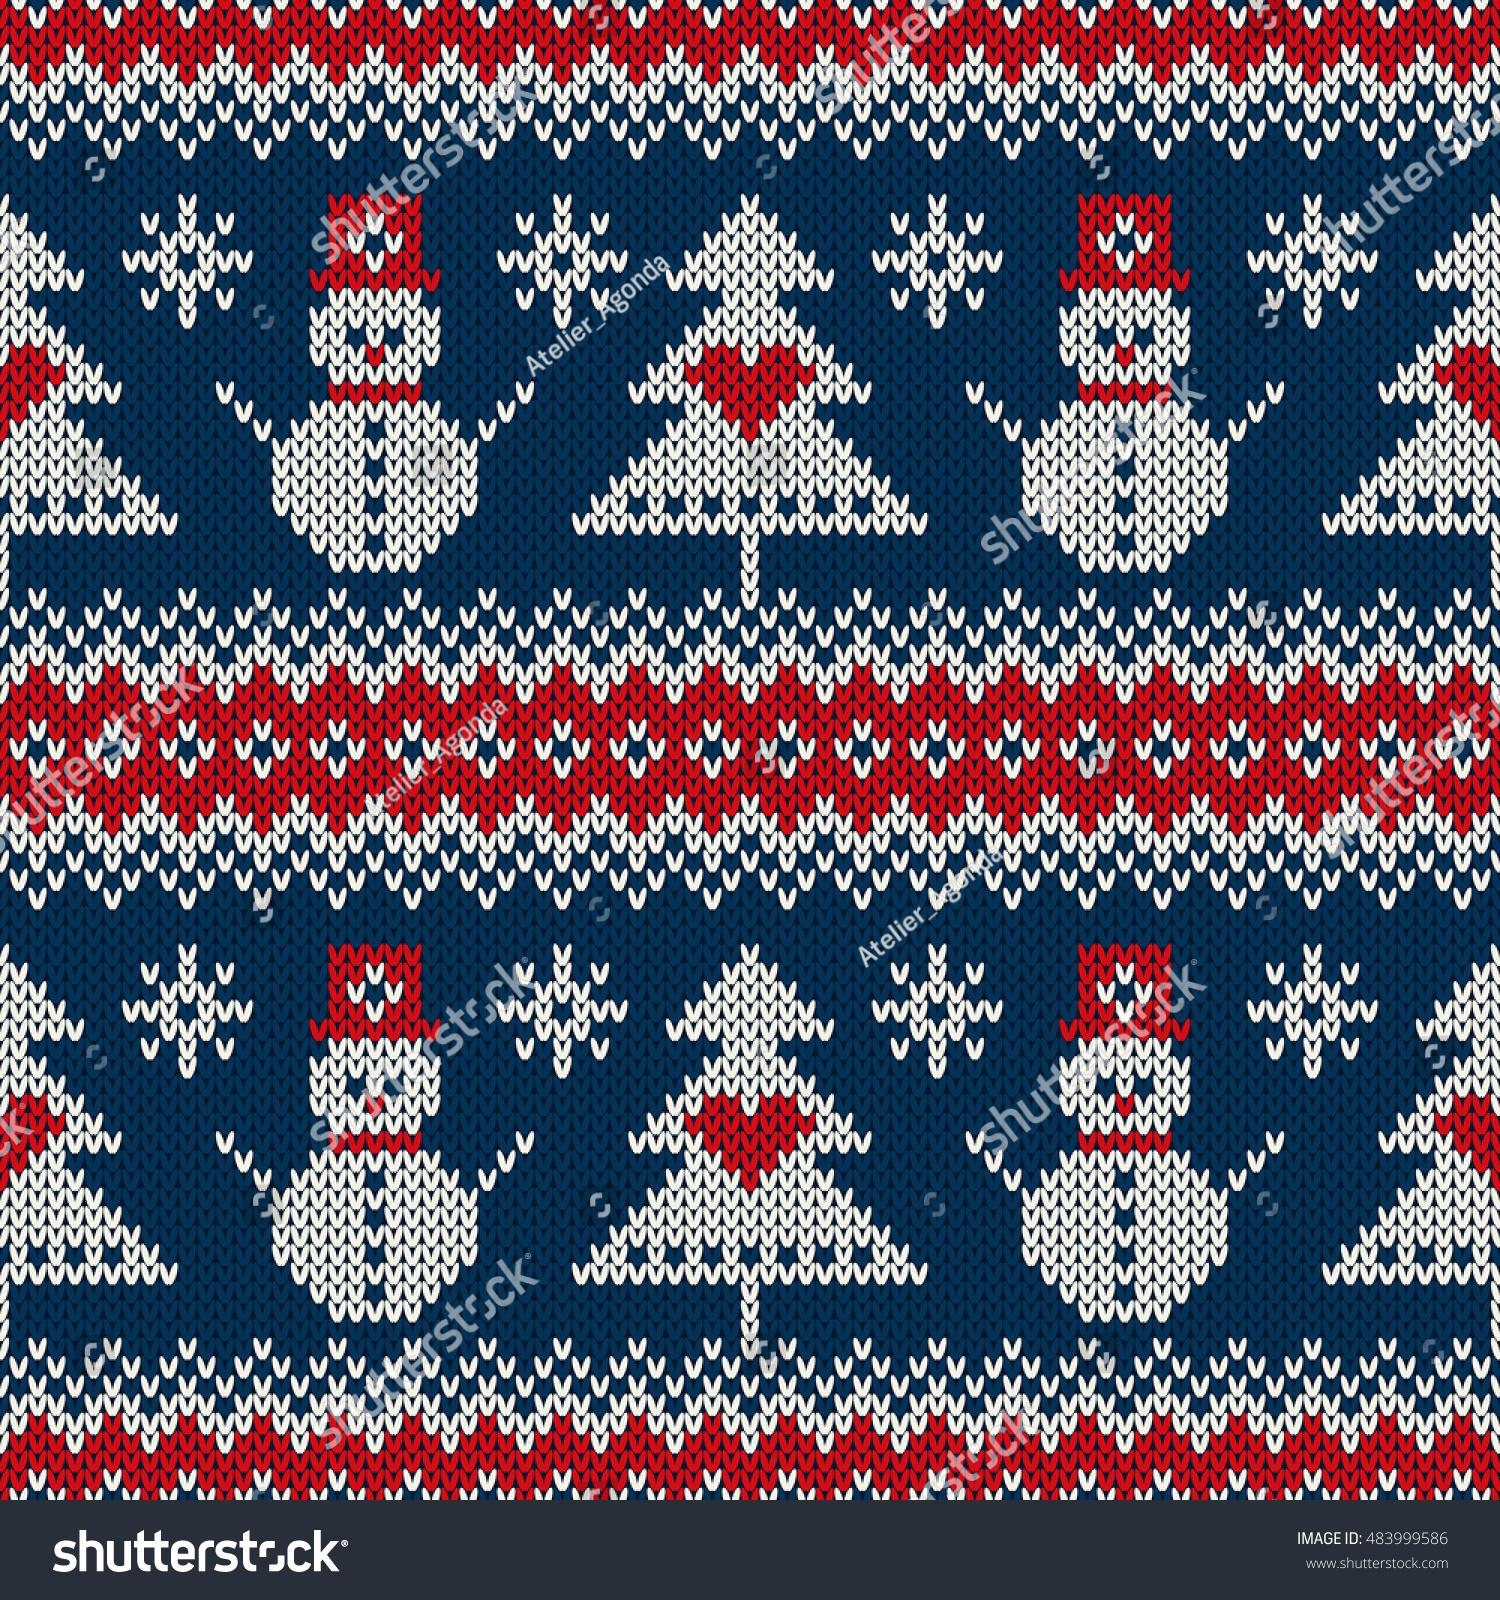 Winter Holiday Knitting Sweater Design Snowman Stock Vector ...